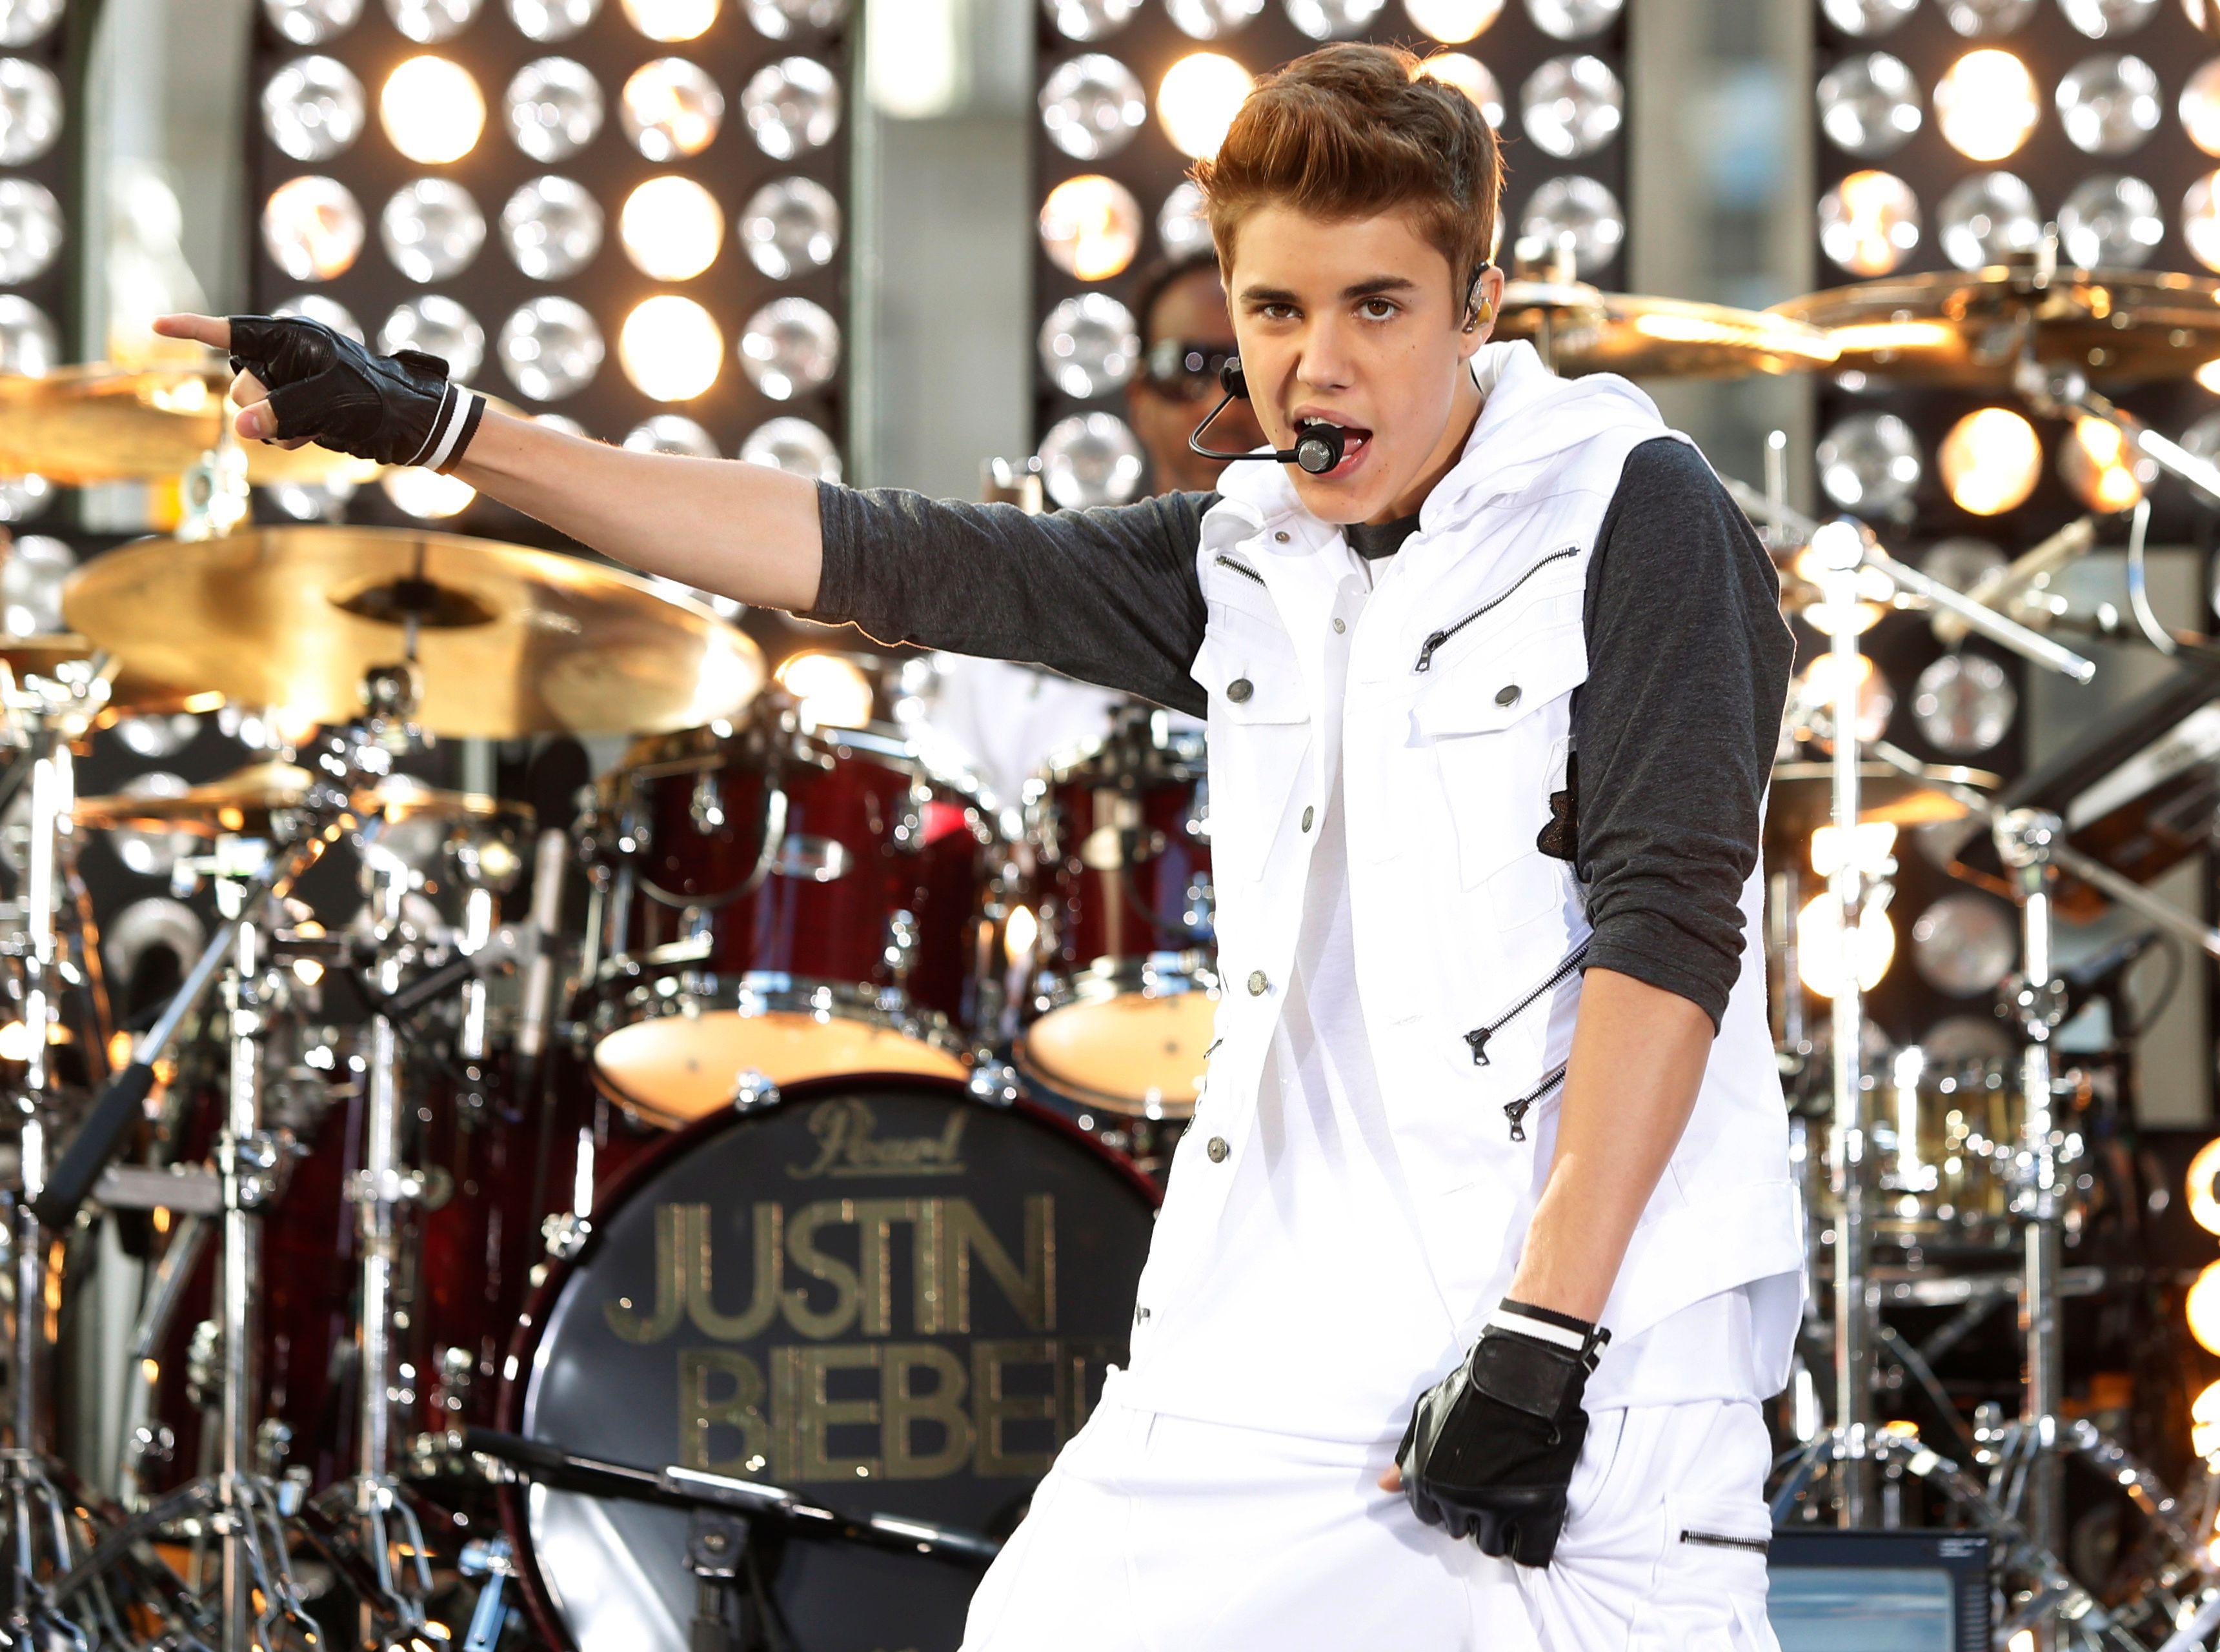 Justin Bieber sur scène